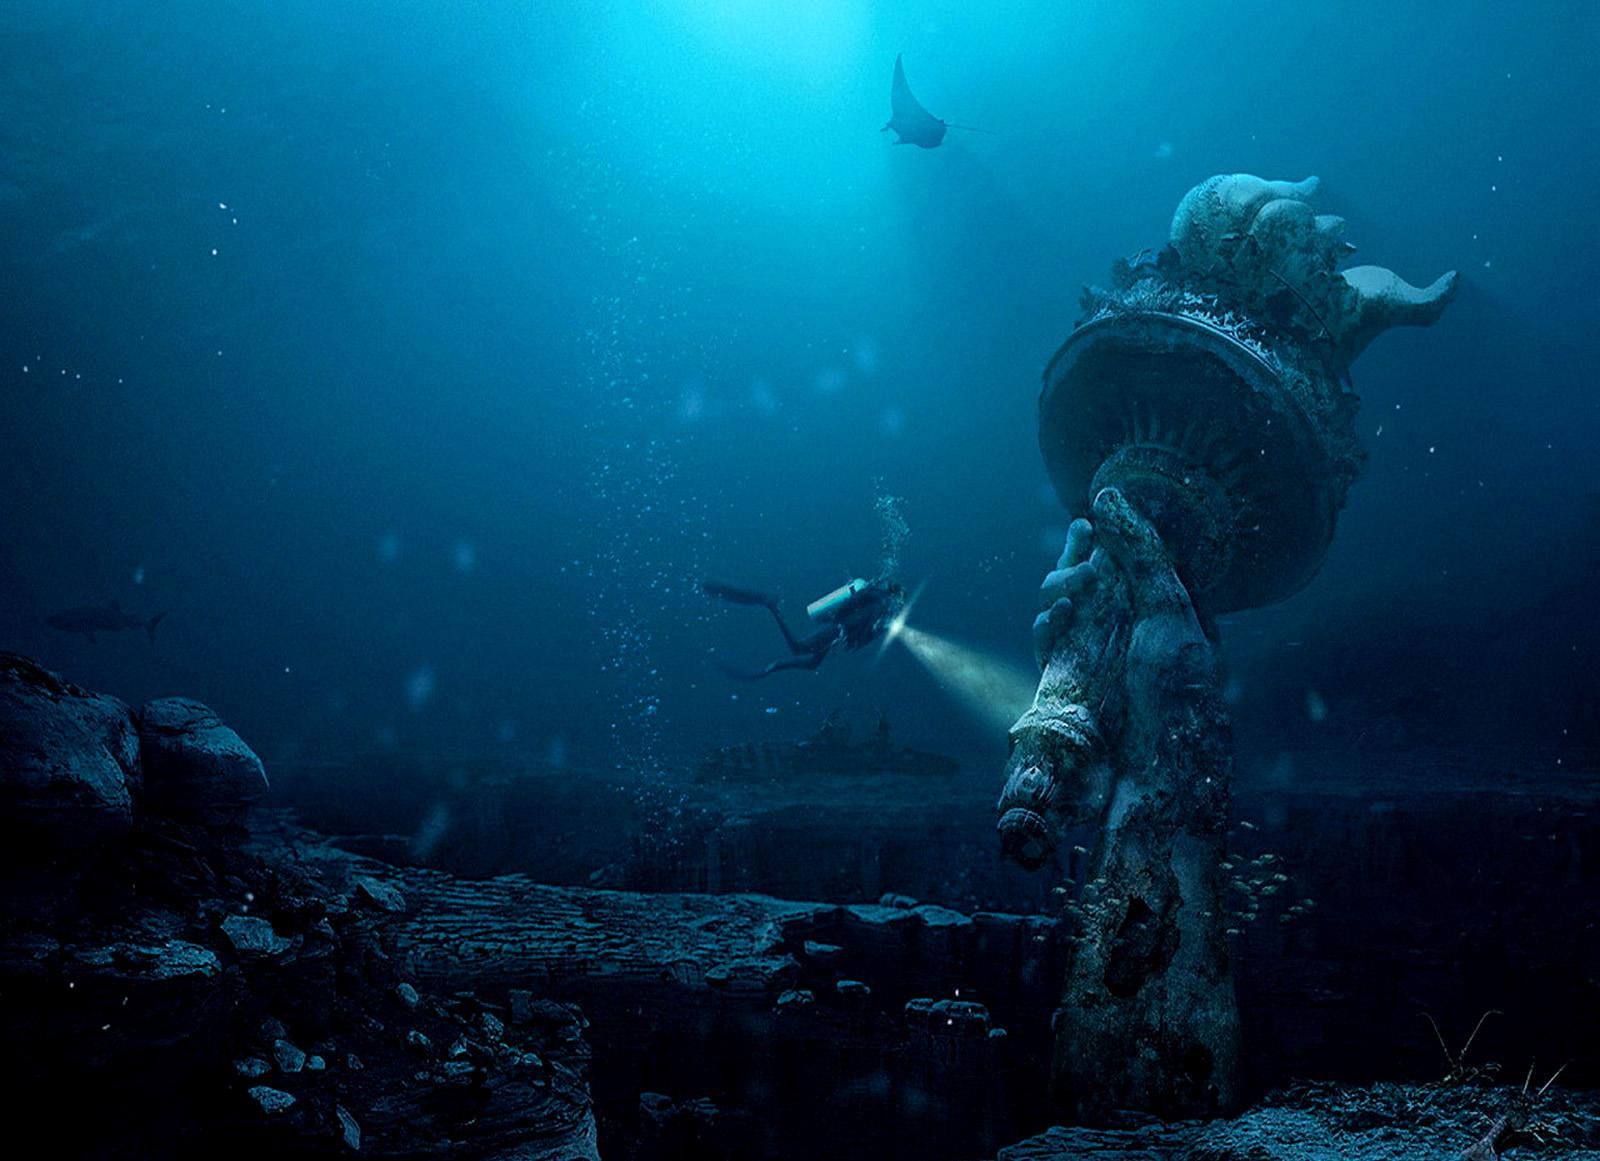 Download Ocean Deepsea Wallpaper 1600x1161 Wallpoper 403080 1600x1161